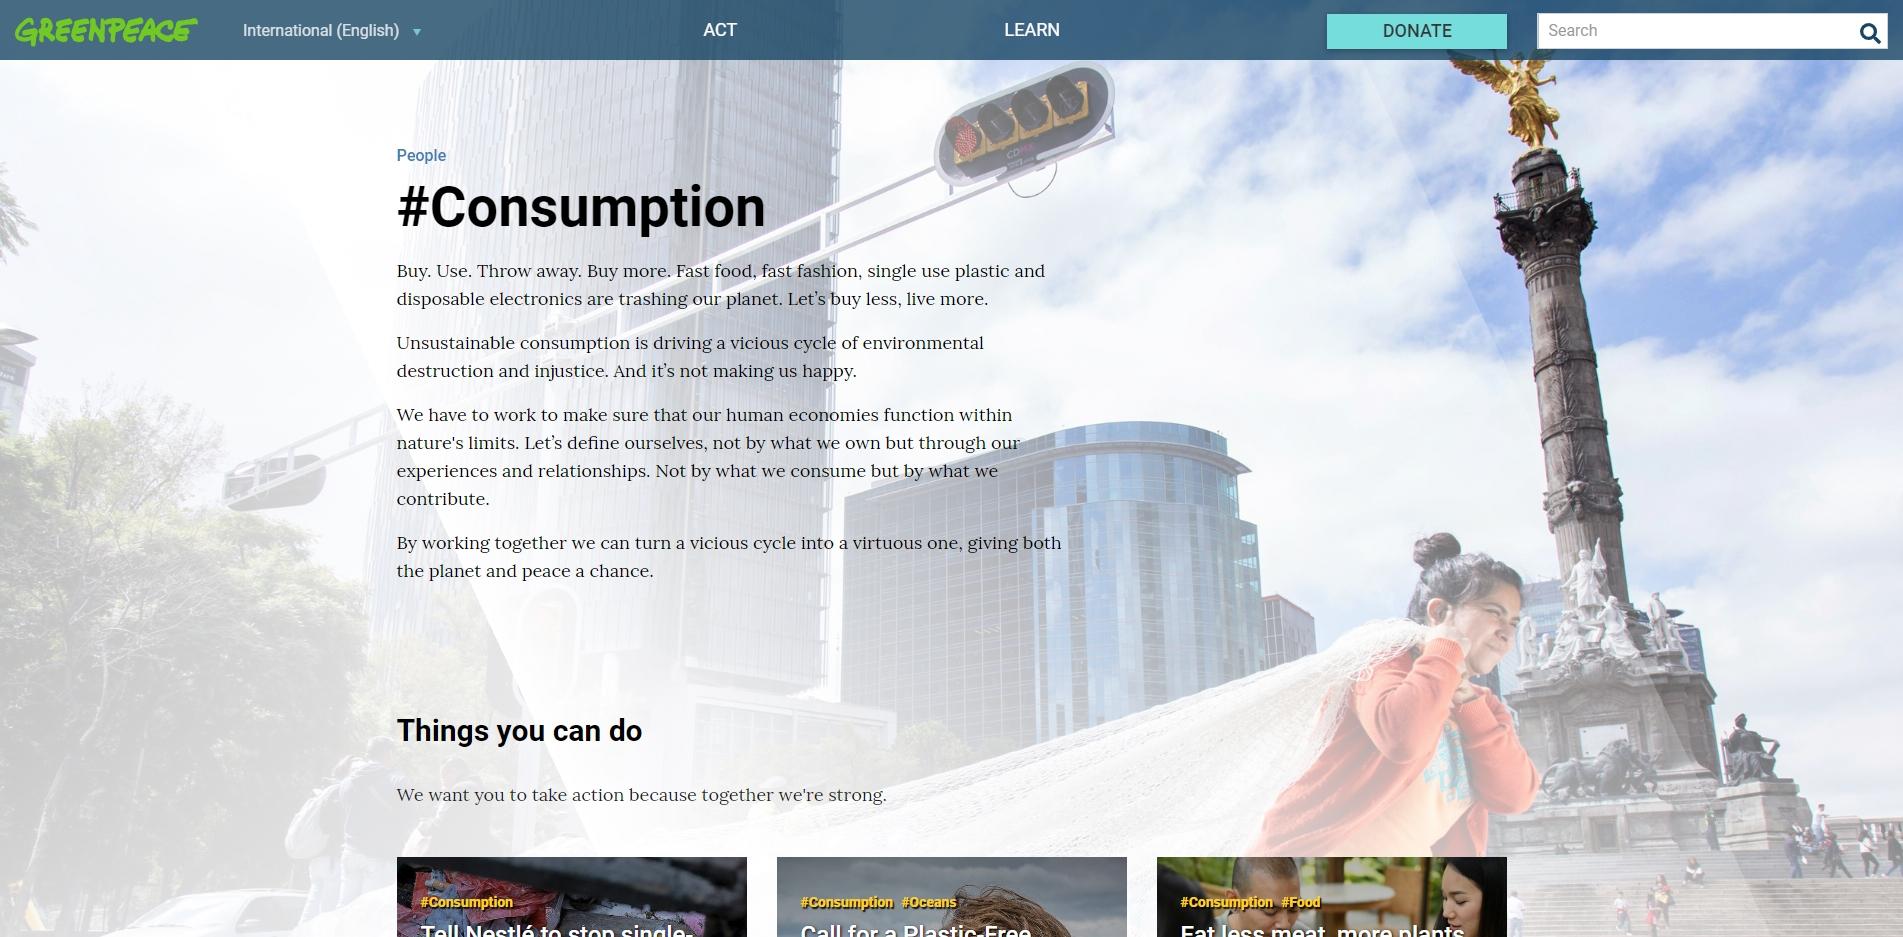 Consumption_-_Greenpeace_International_-_Google_Ch_2019-07-18_10-41-17.jpg